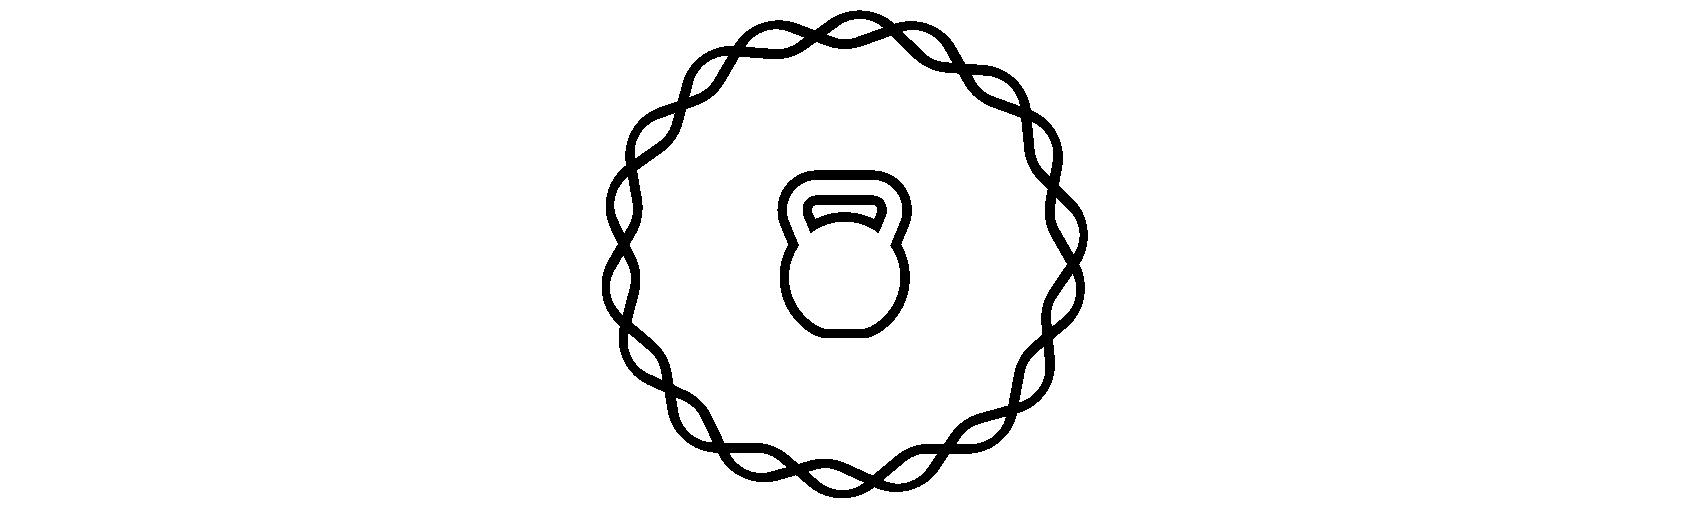 RAW-Membership-Icons-16.png